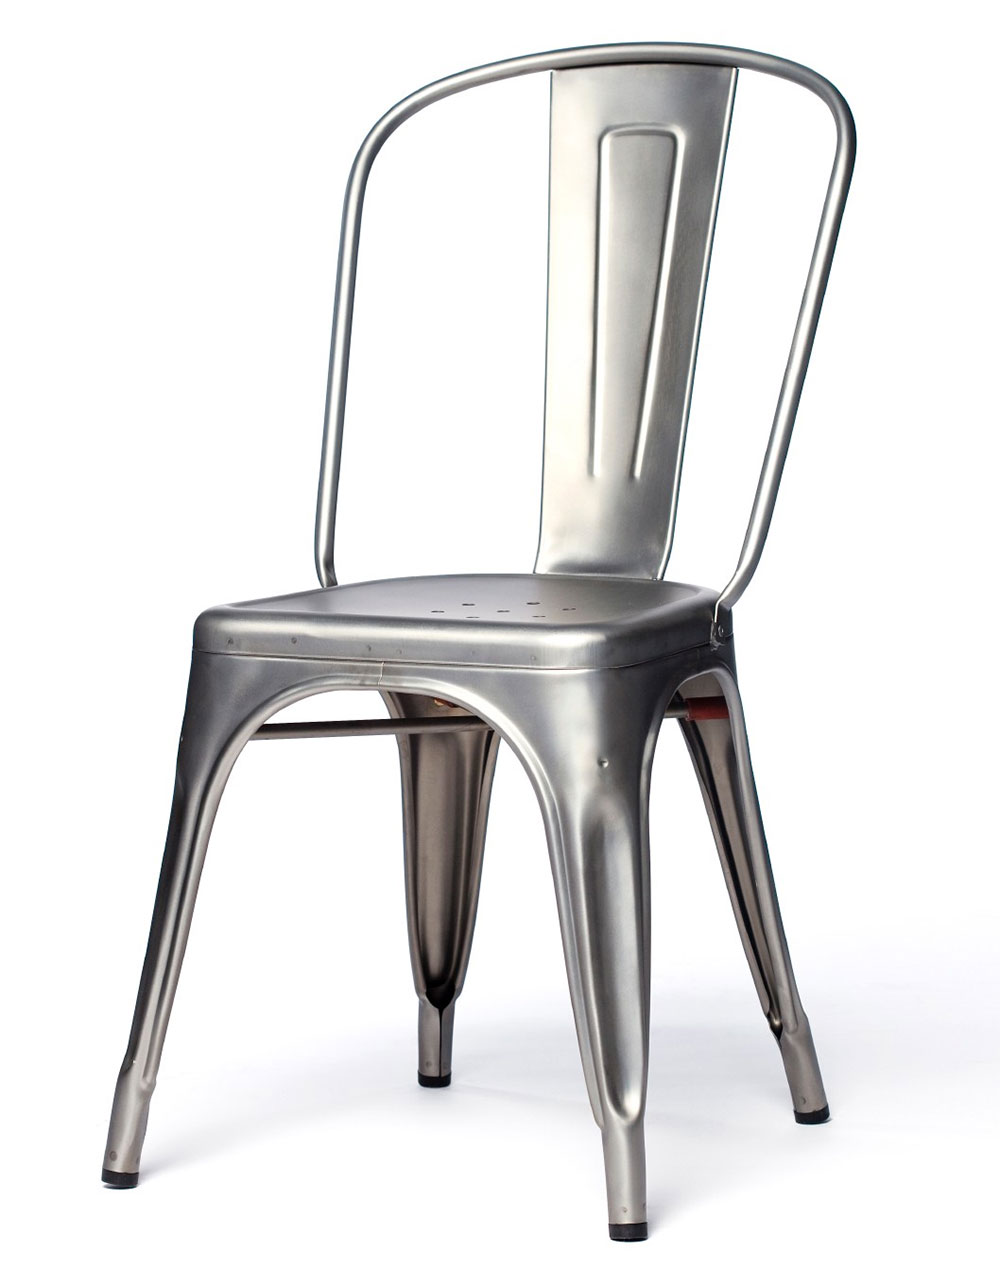 chaise tolix industrielle. Black Bedroom Furniture Sets. Home Design Ideas